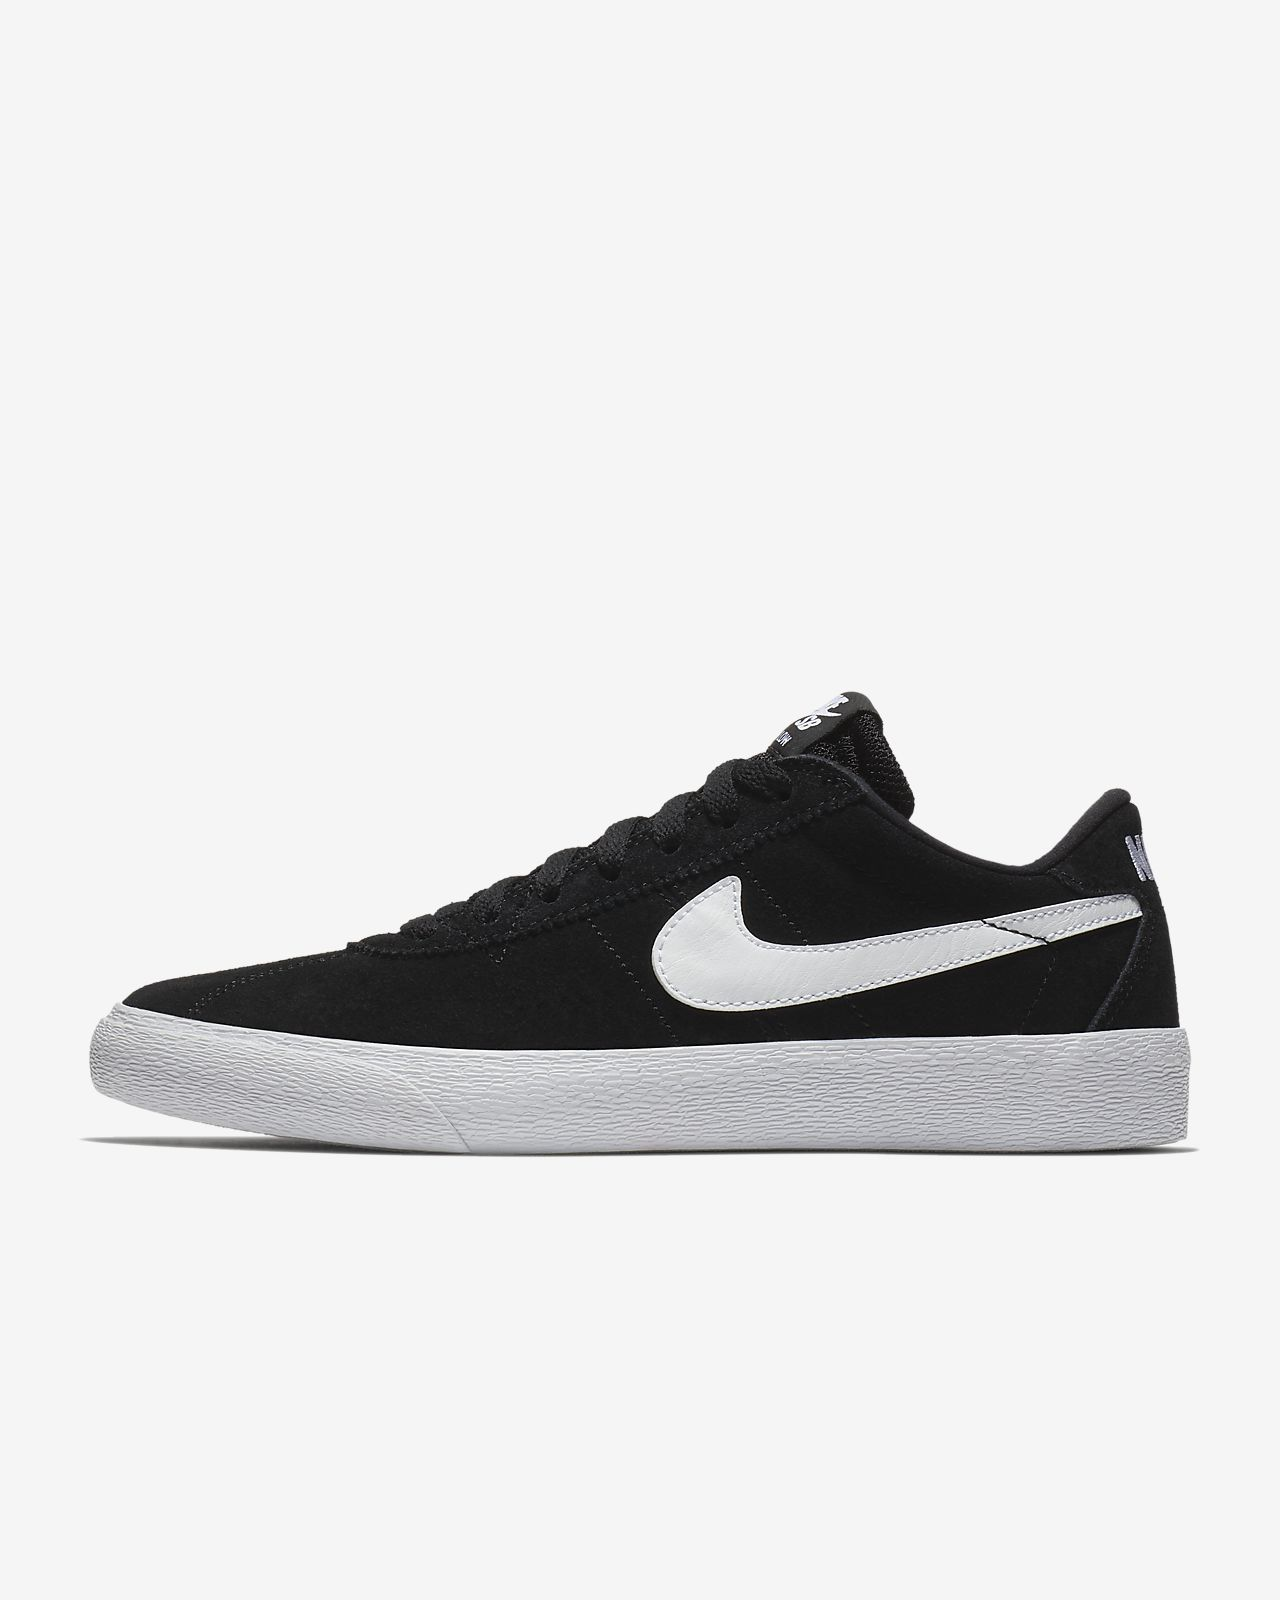 on sale c035f ad7c7 ... Nike SB Zoom Bruin Low Zapatillas de skateboard - Mujer